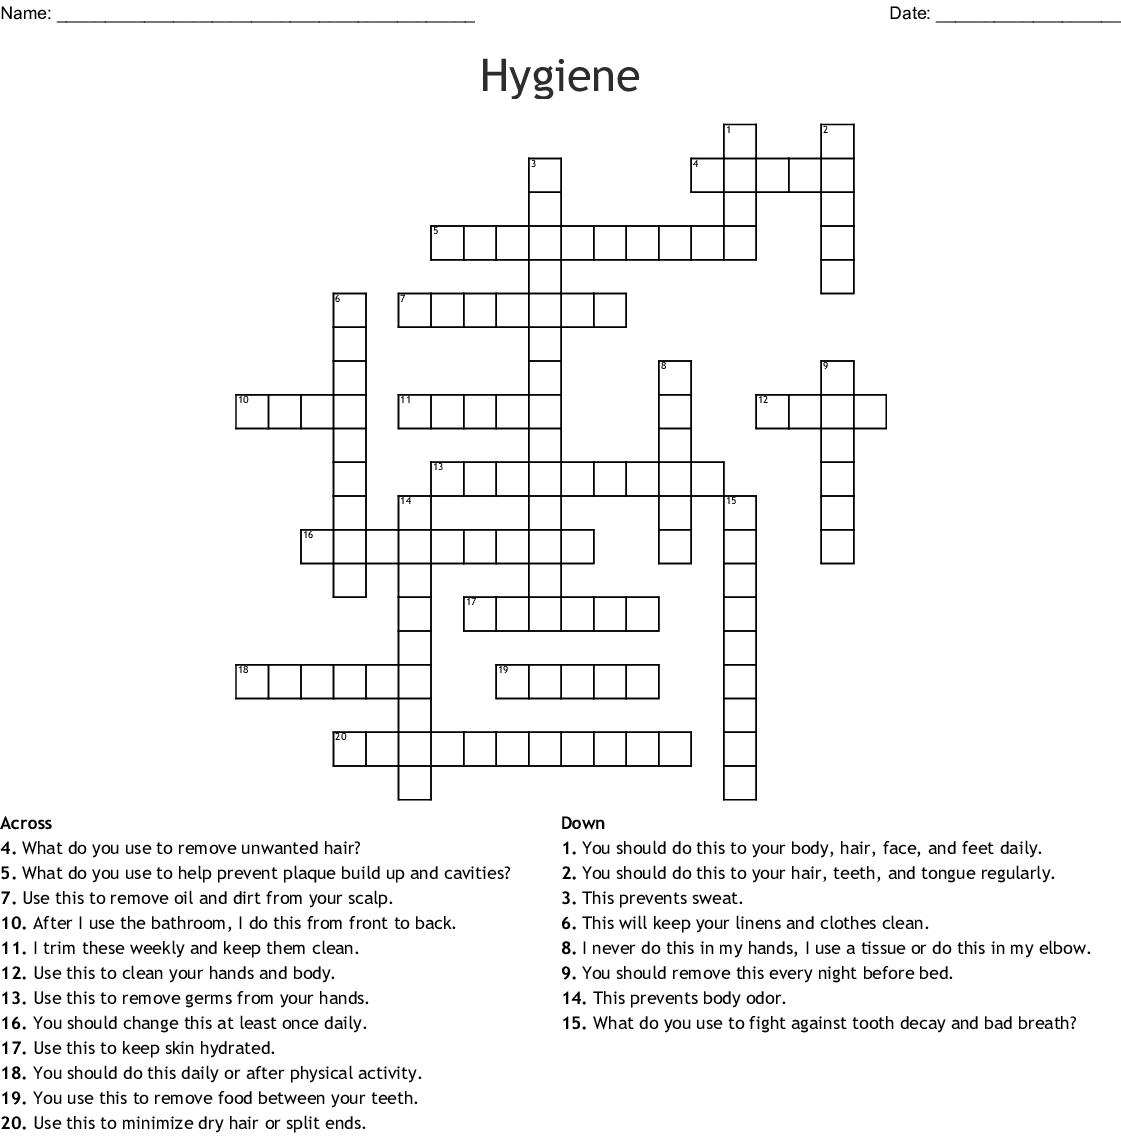 Hygiene Crossword